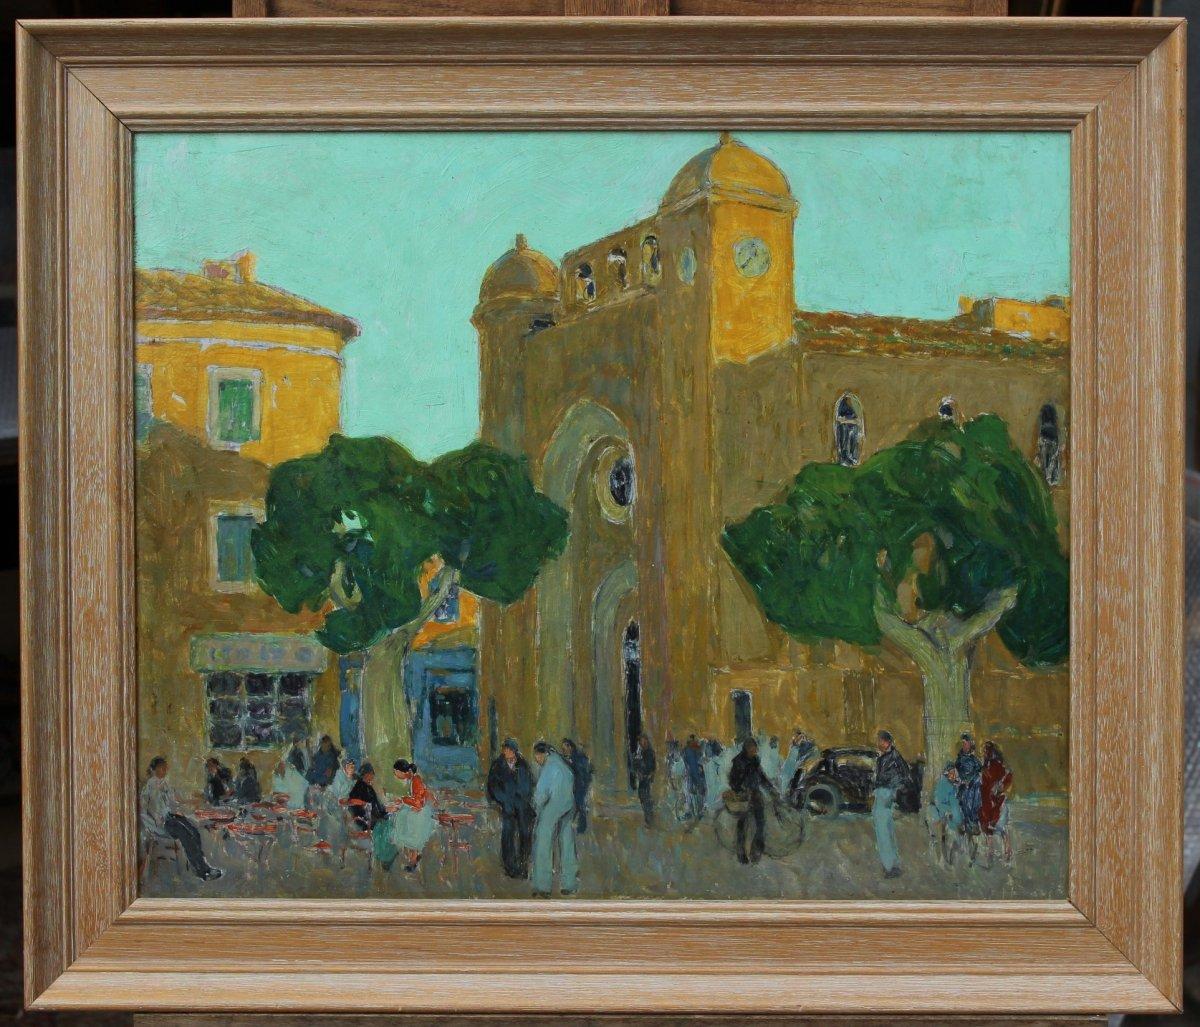 Fernand Lantoine (1876/78-c.1955), Church Of Aigues-mortes